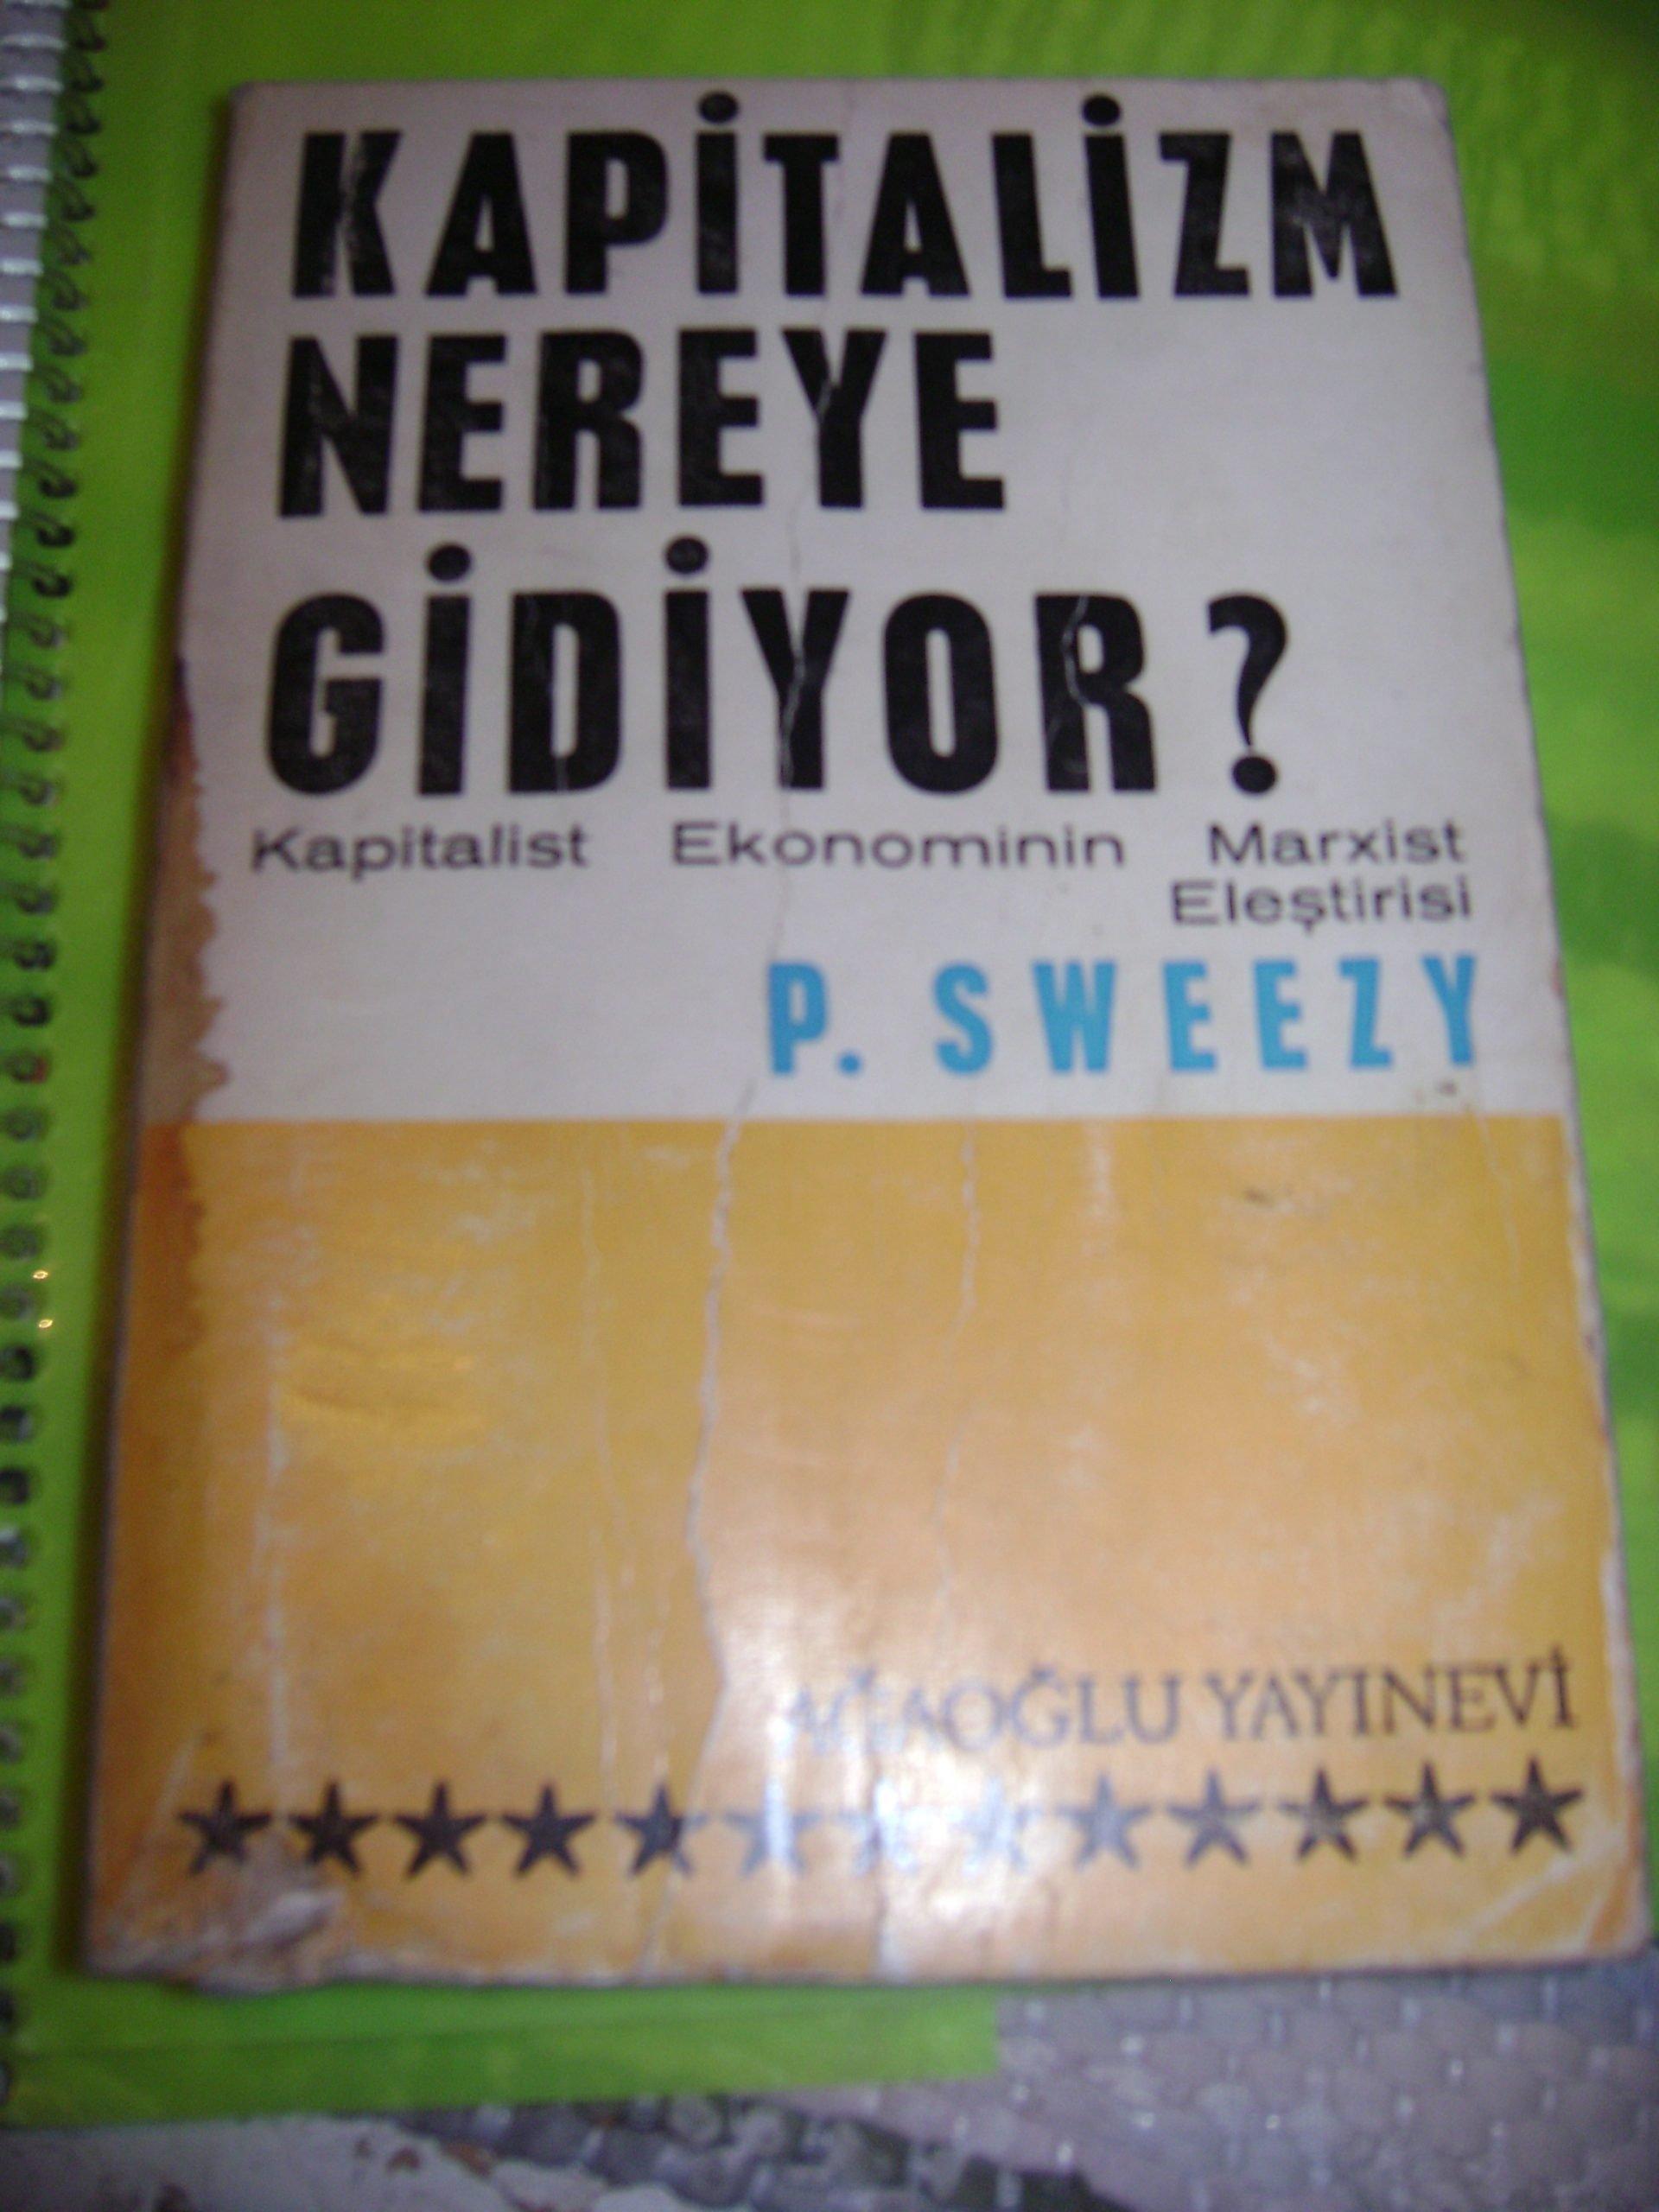 KAPITALİZM NEREYE GİDİYOR? /P.SWEEZY/15 tl